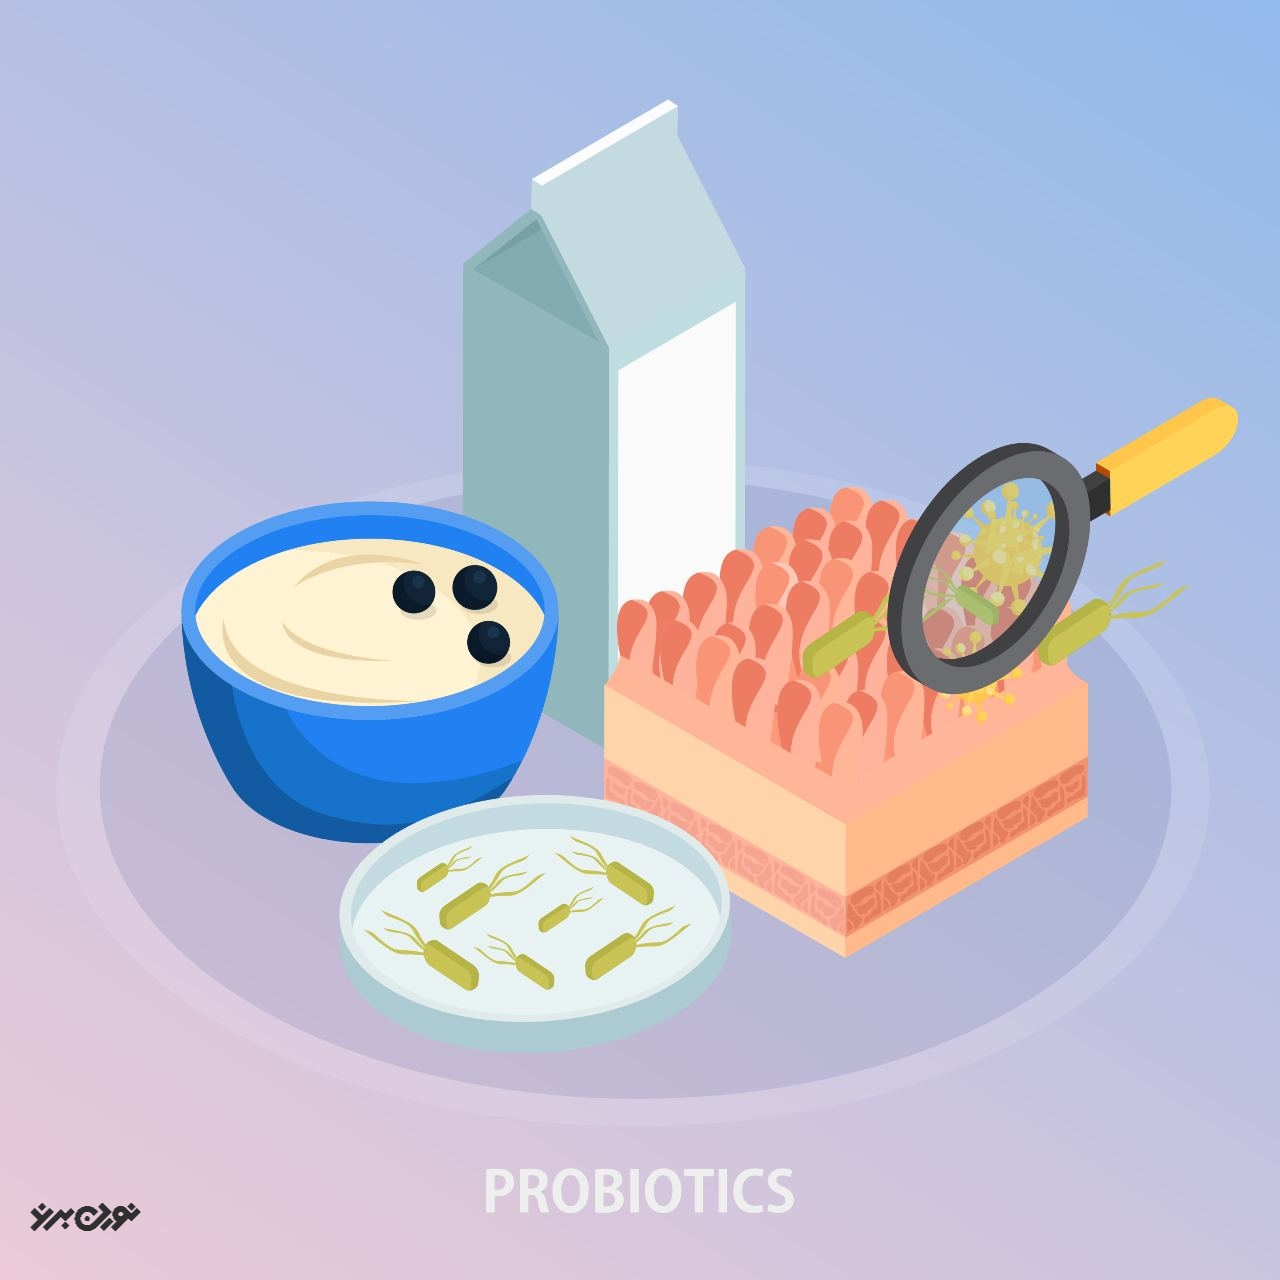 پروبیوتیکها